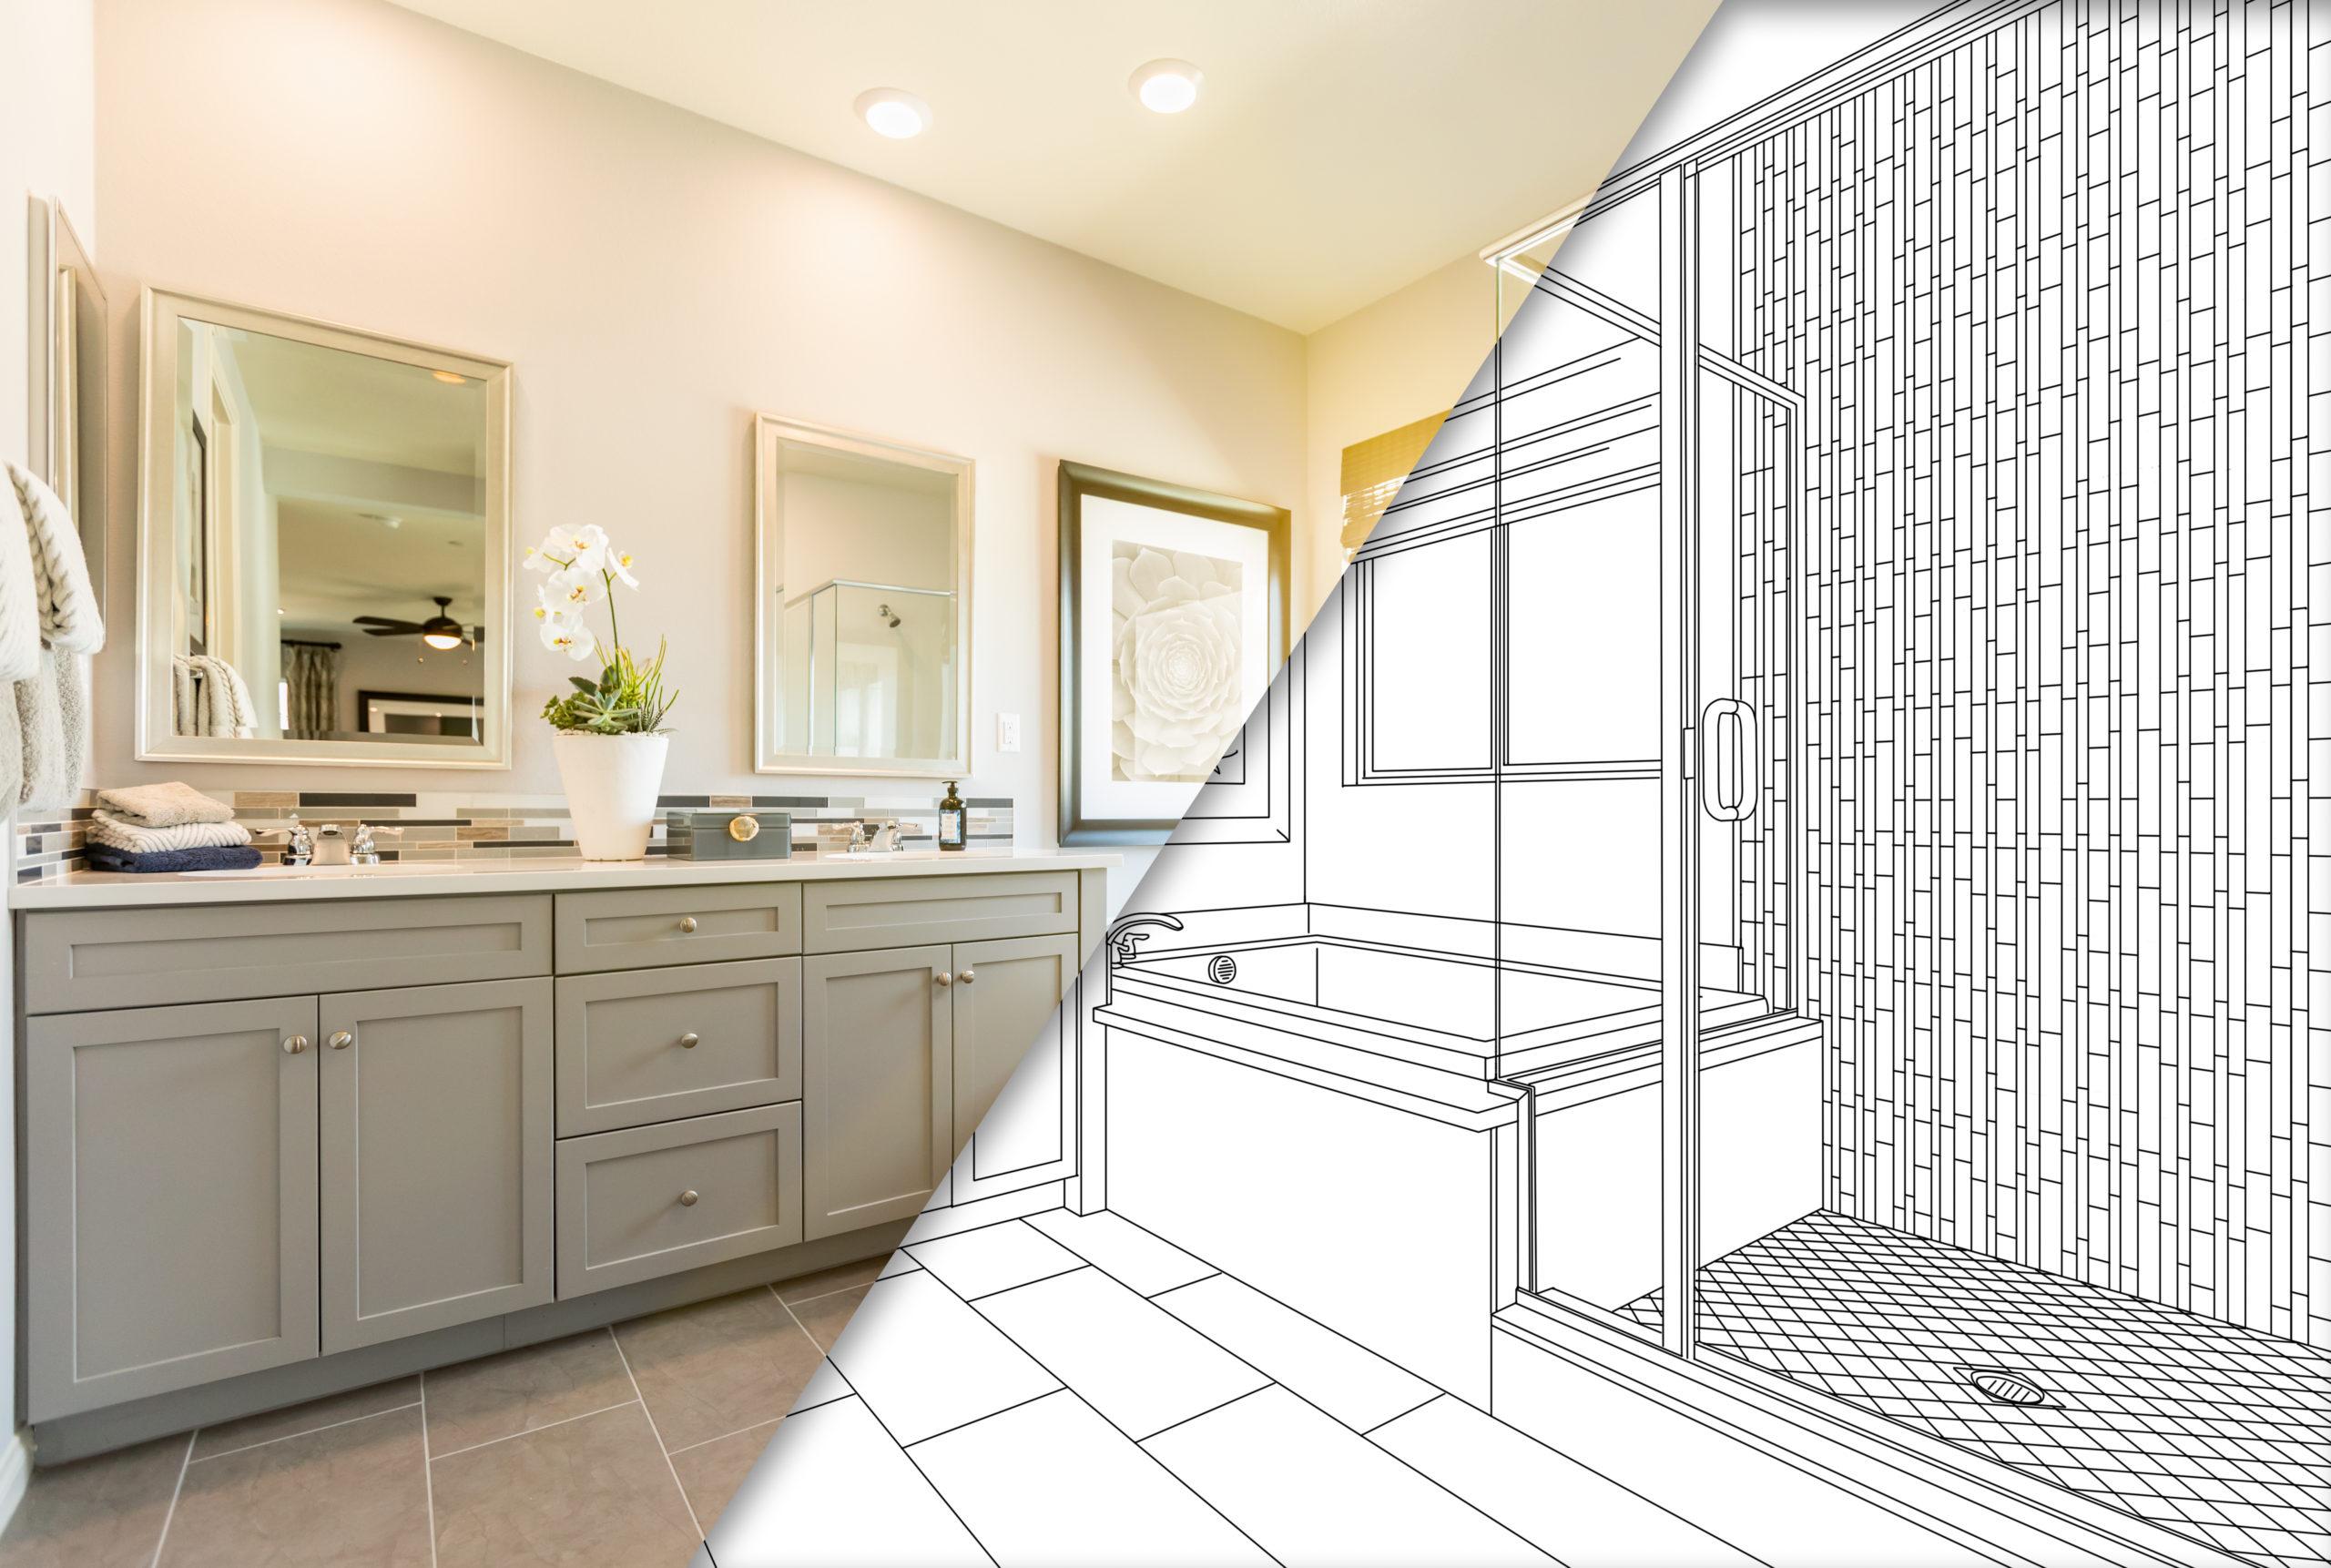 Image showing a bathroom half renovated, half blueprint